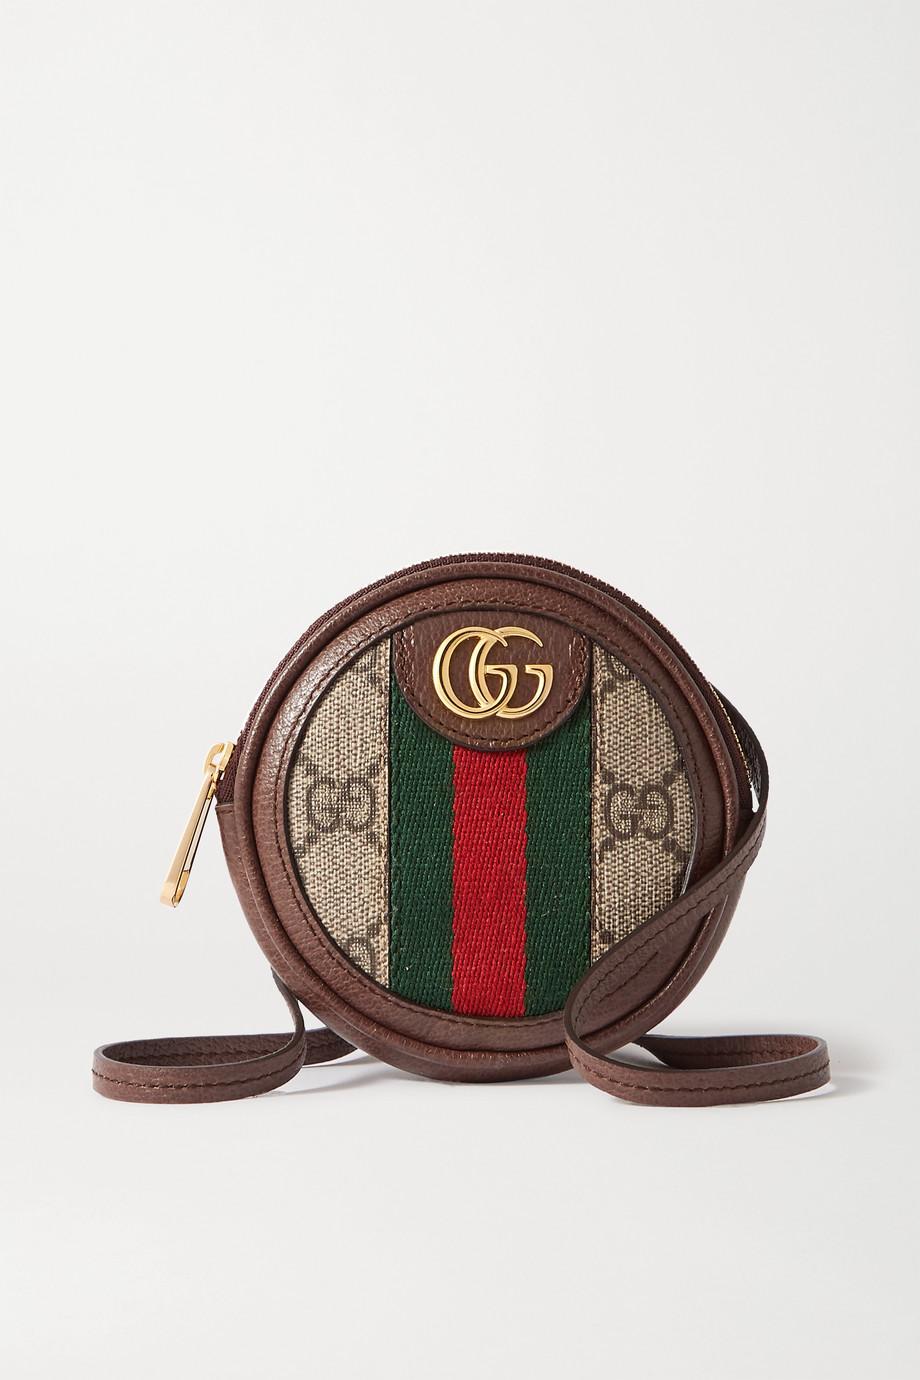 Gucci Ophidia Circle 纹理皮革边饰印花涂层帆布迷你单肩包